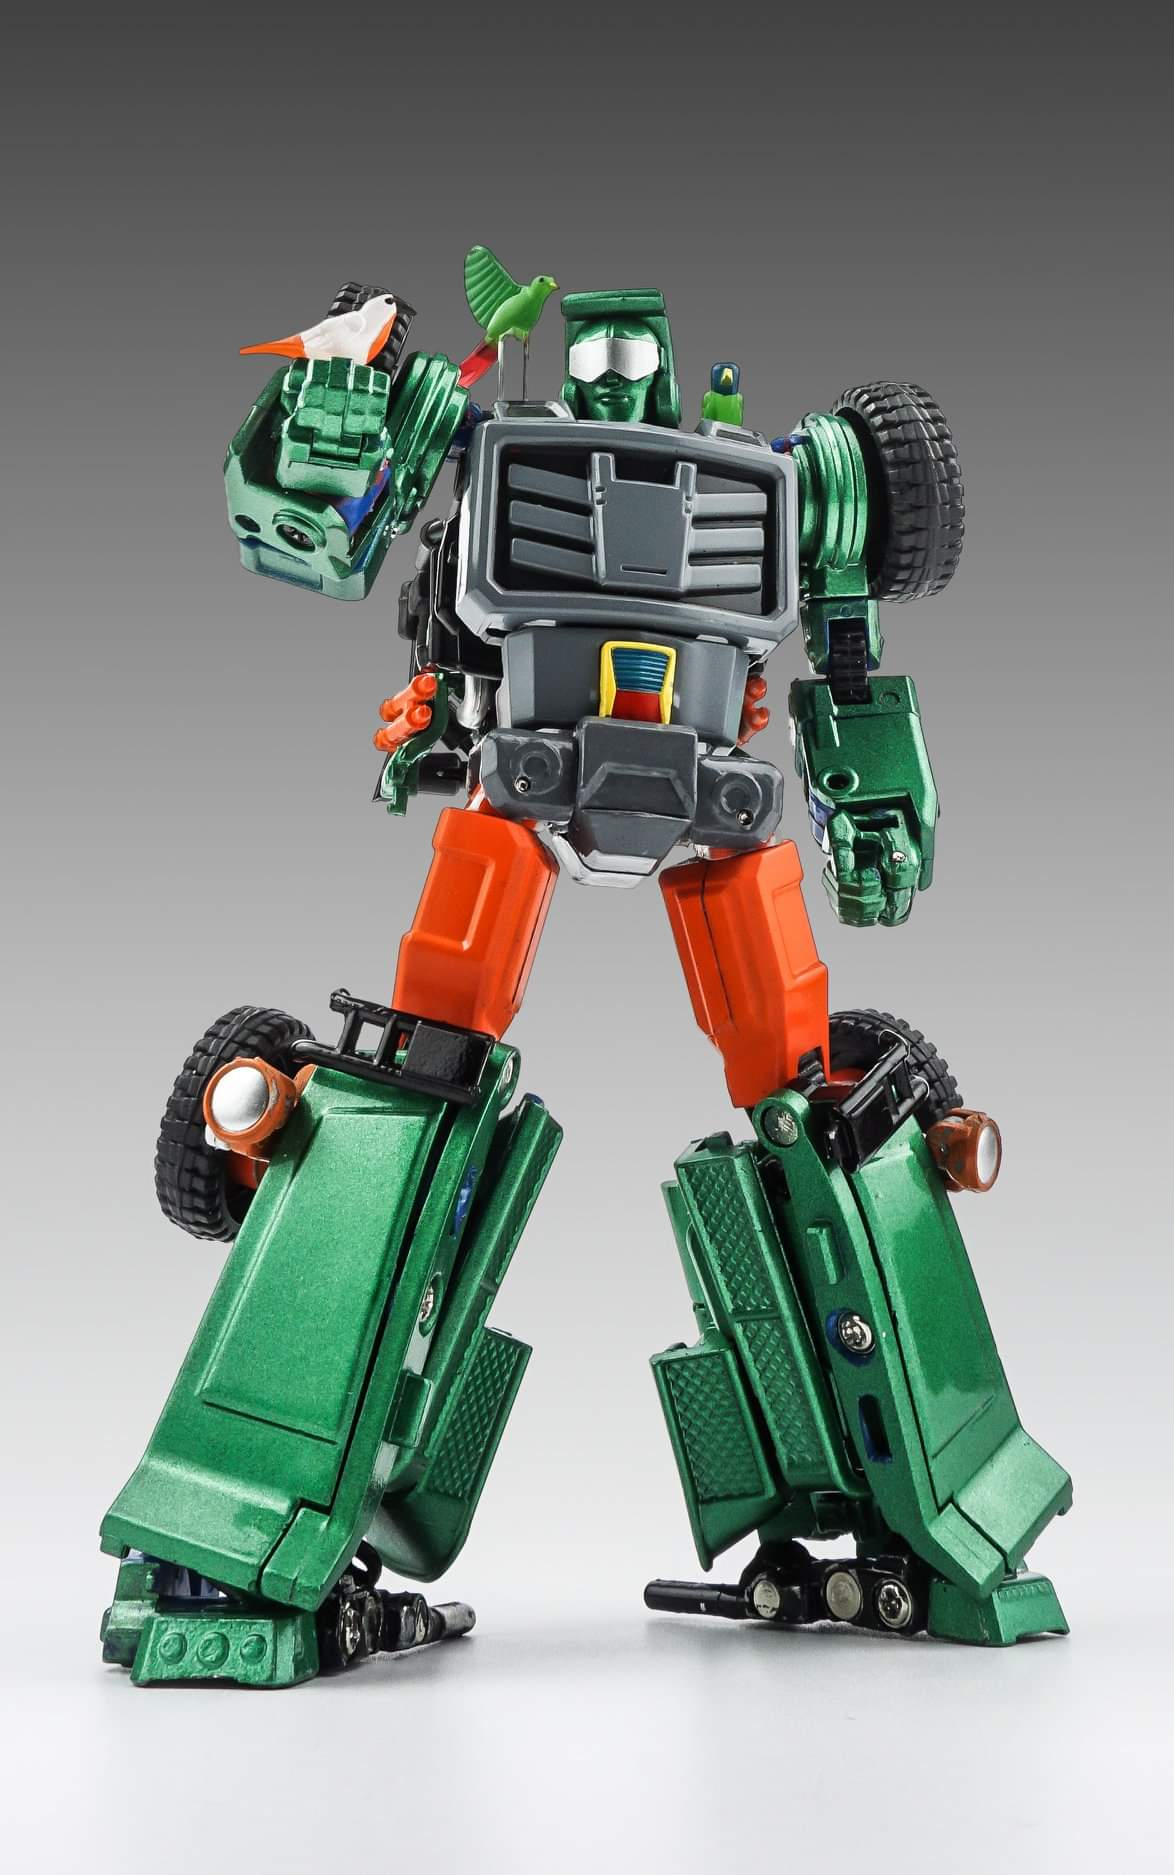 [X-Transbots] Produit Tiers - Minibots MP - Gamme MM - Page 12 ULtolFWp_o